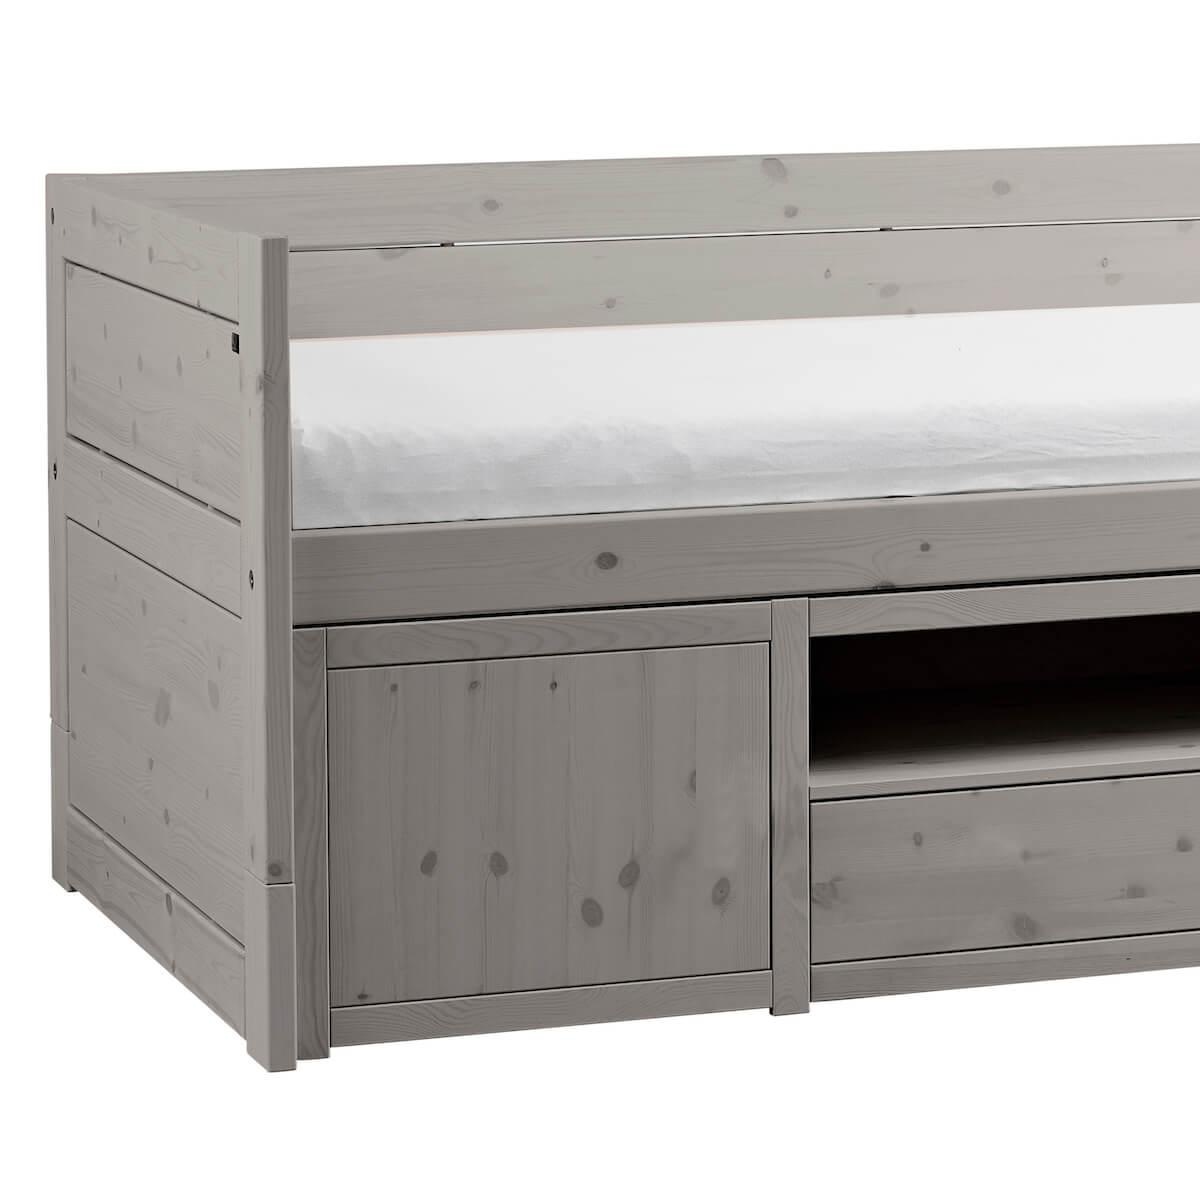 Cama cabina+pequeño mueble Lifetime grey washed